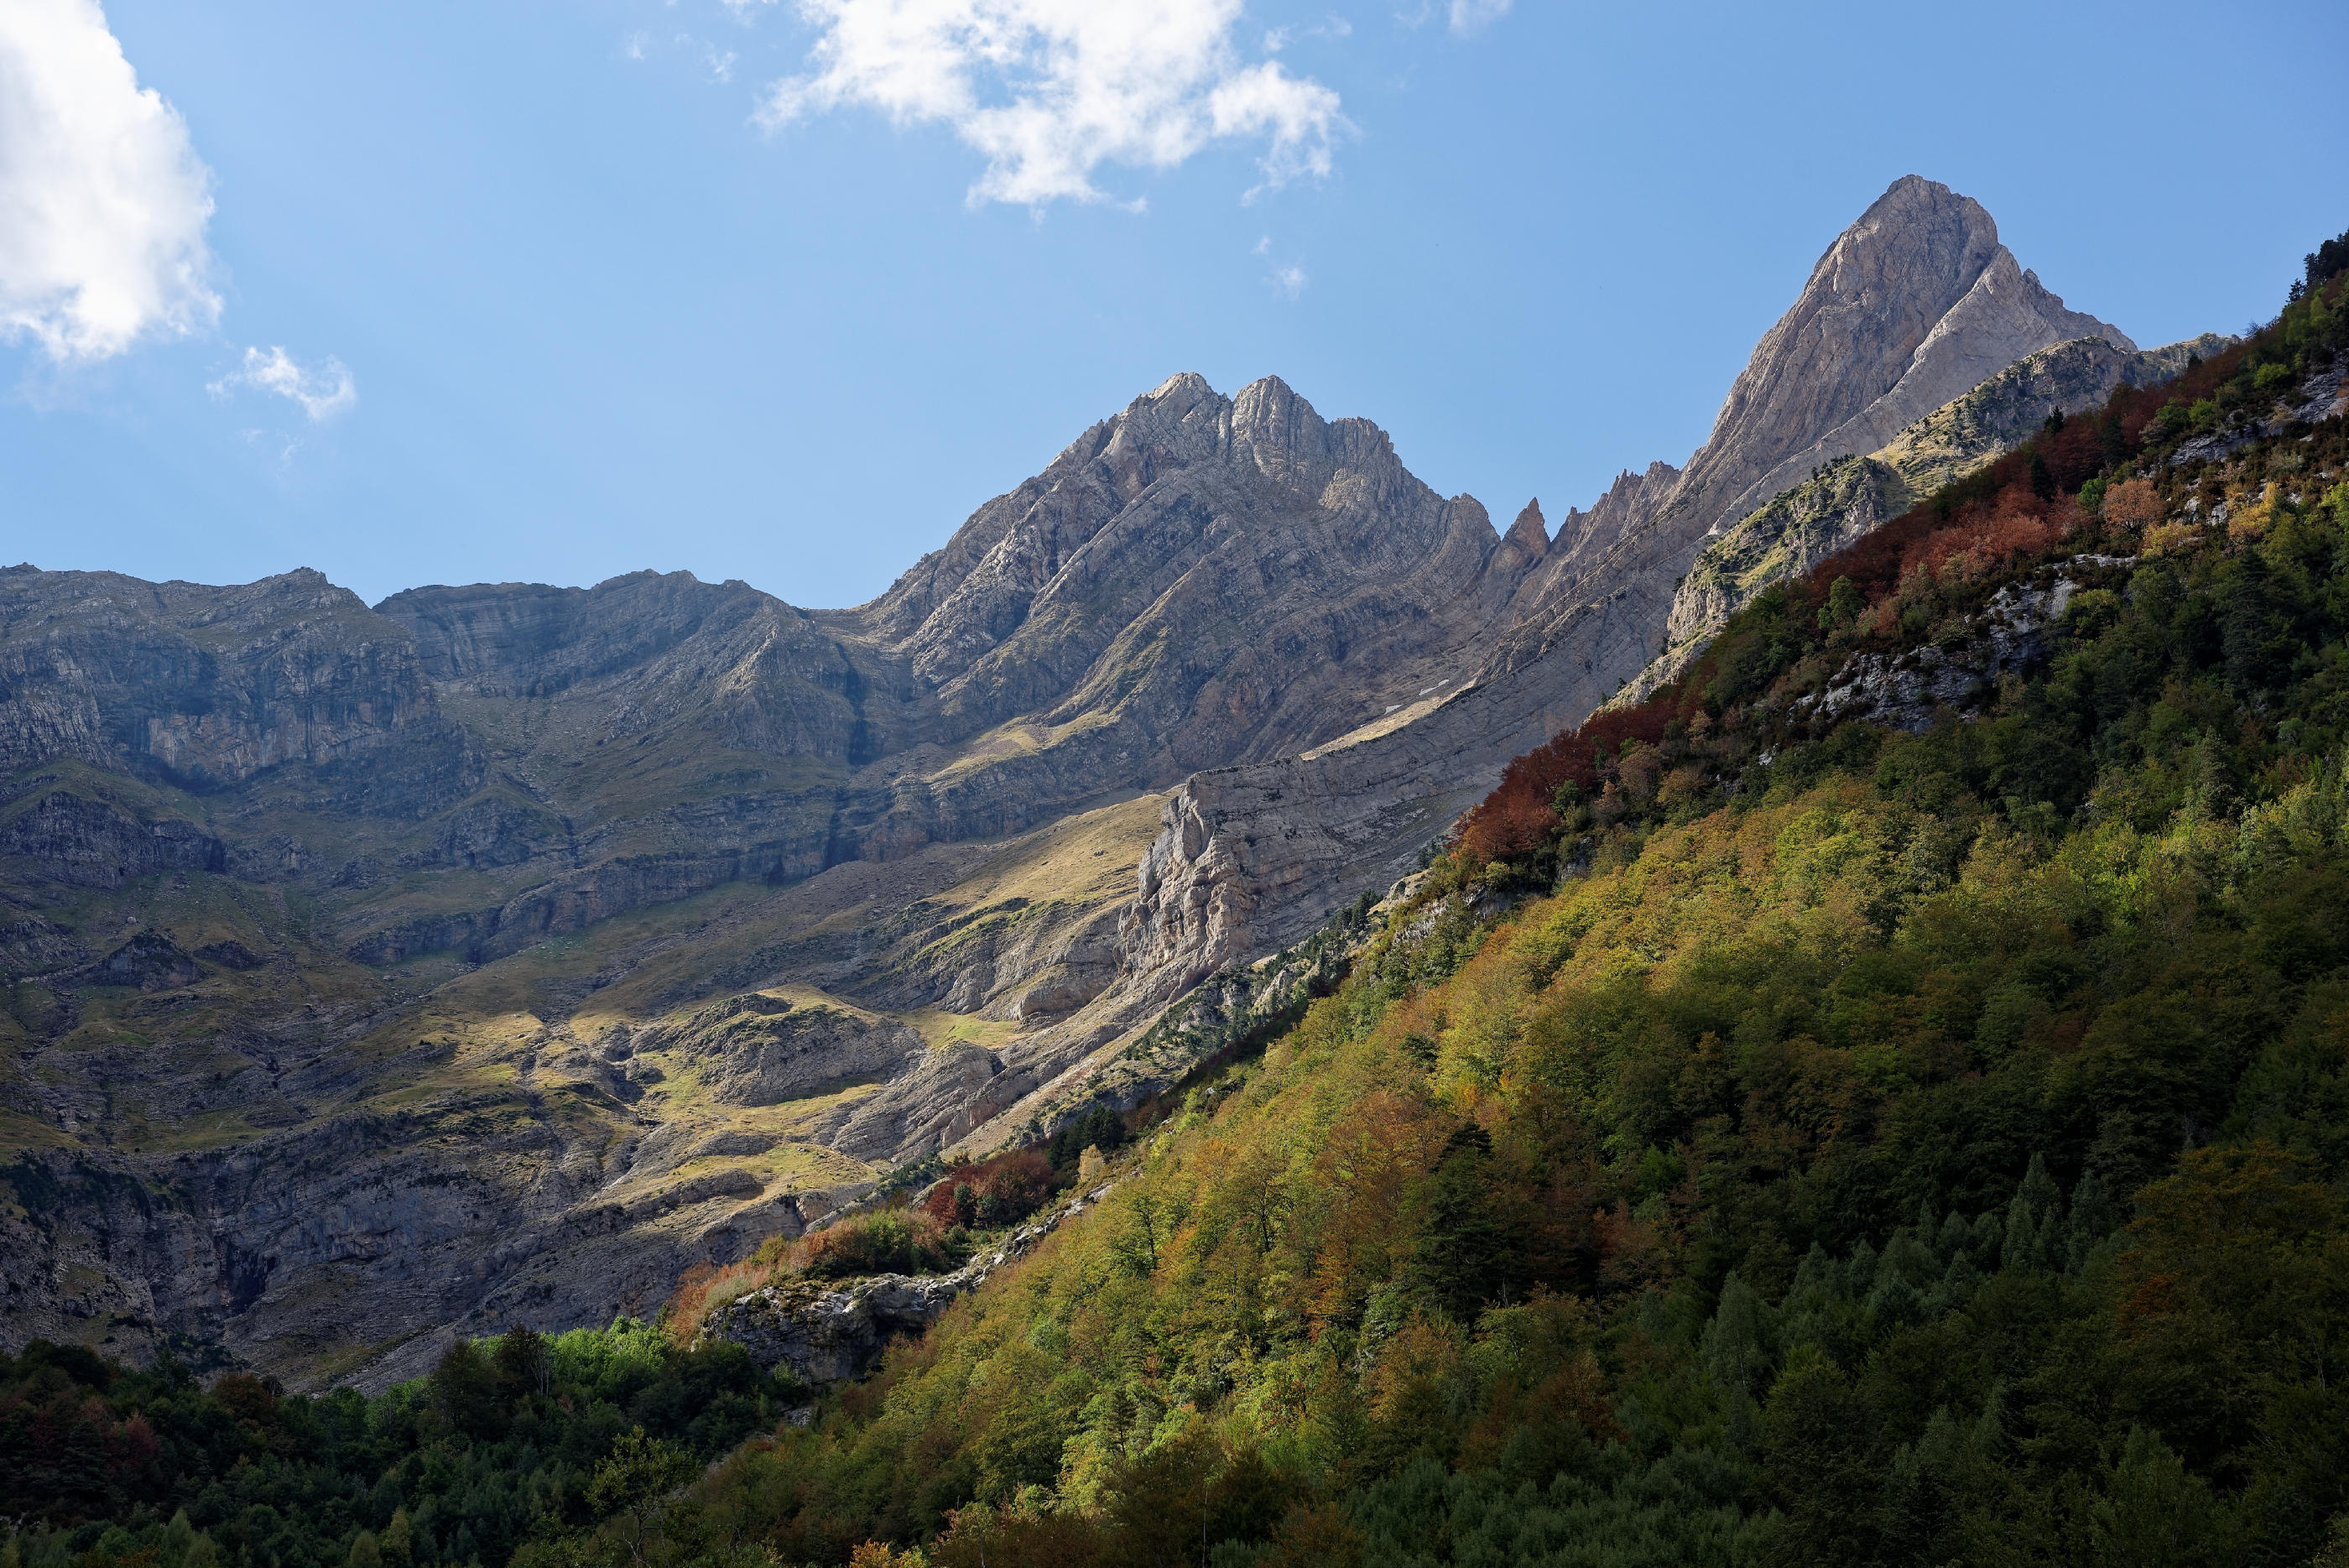 160910-marche-cascade-du-cinca-et-de-la-larri-sobrarbe-aragon-217